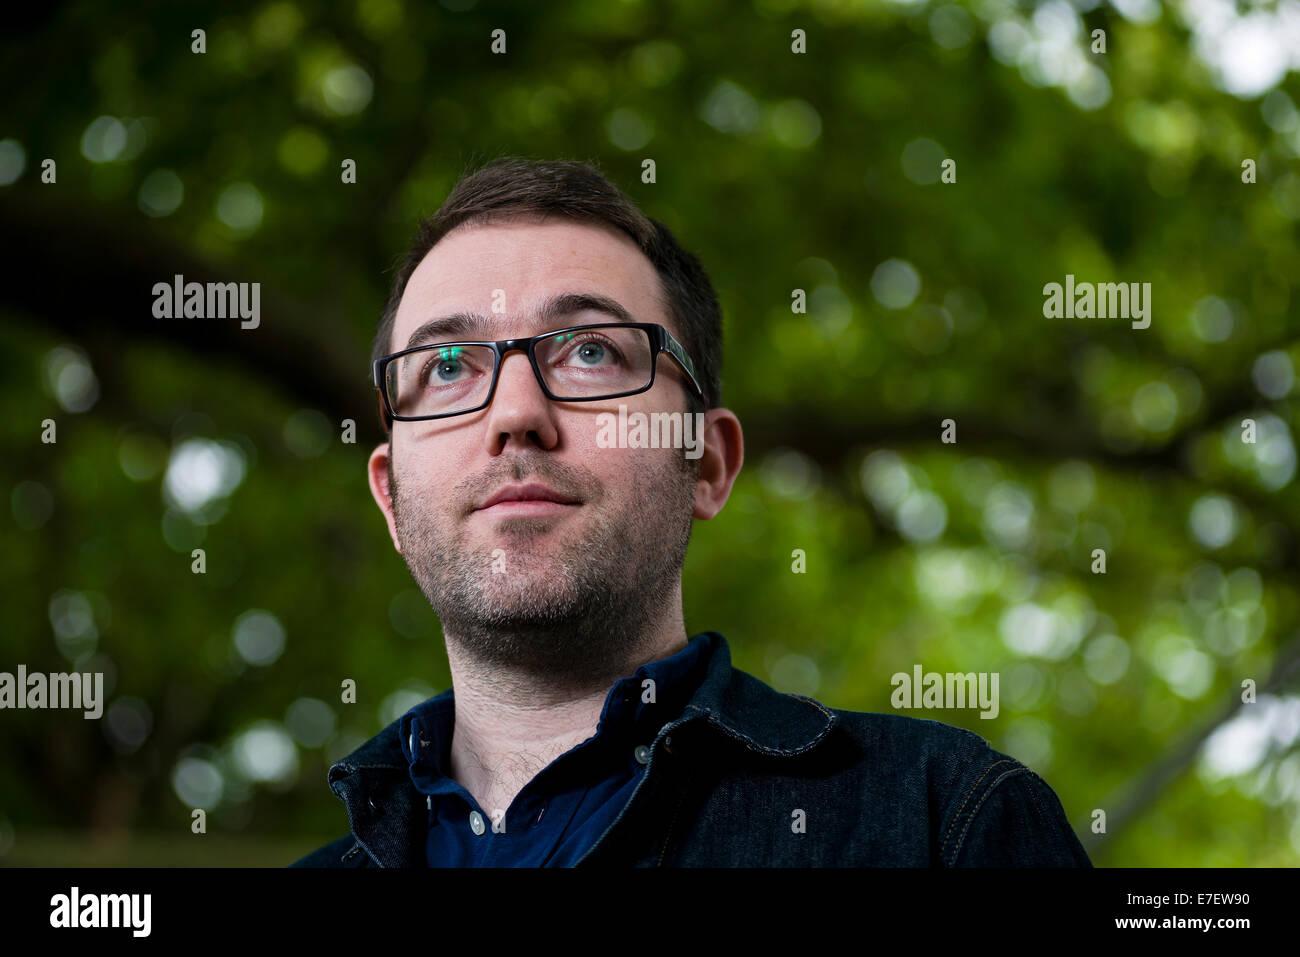 Comic artist and illustrator Adam Murphy appears at the Edinburgh International Book Festival. - Stock Image